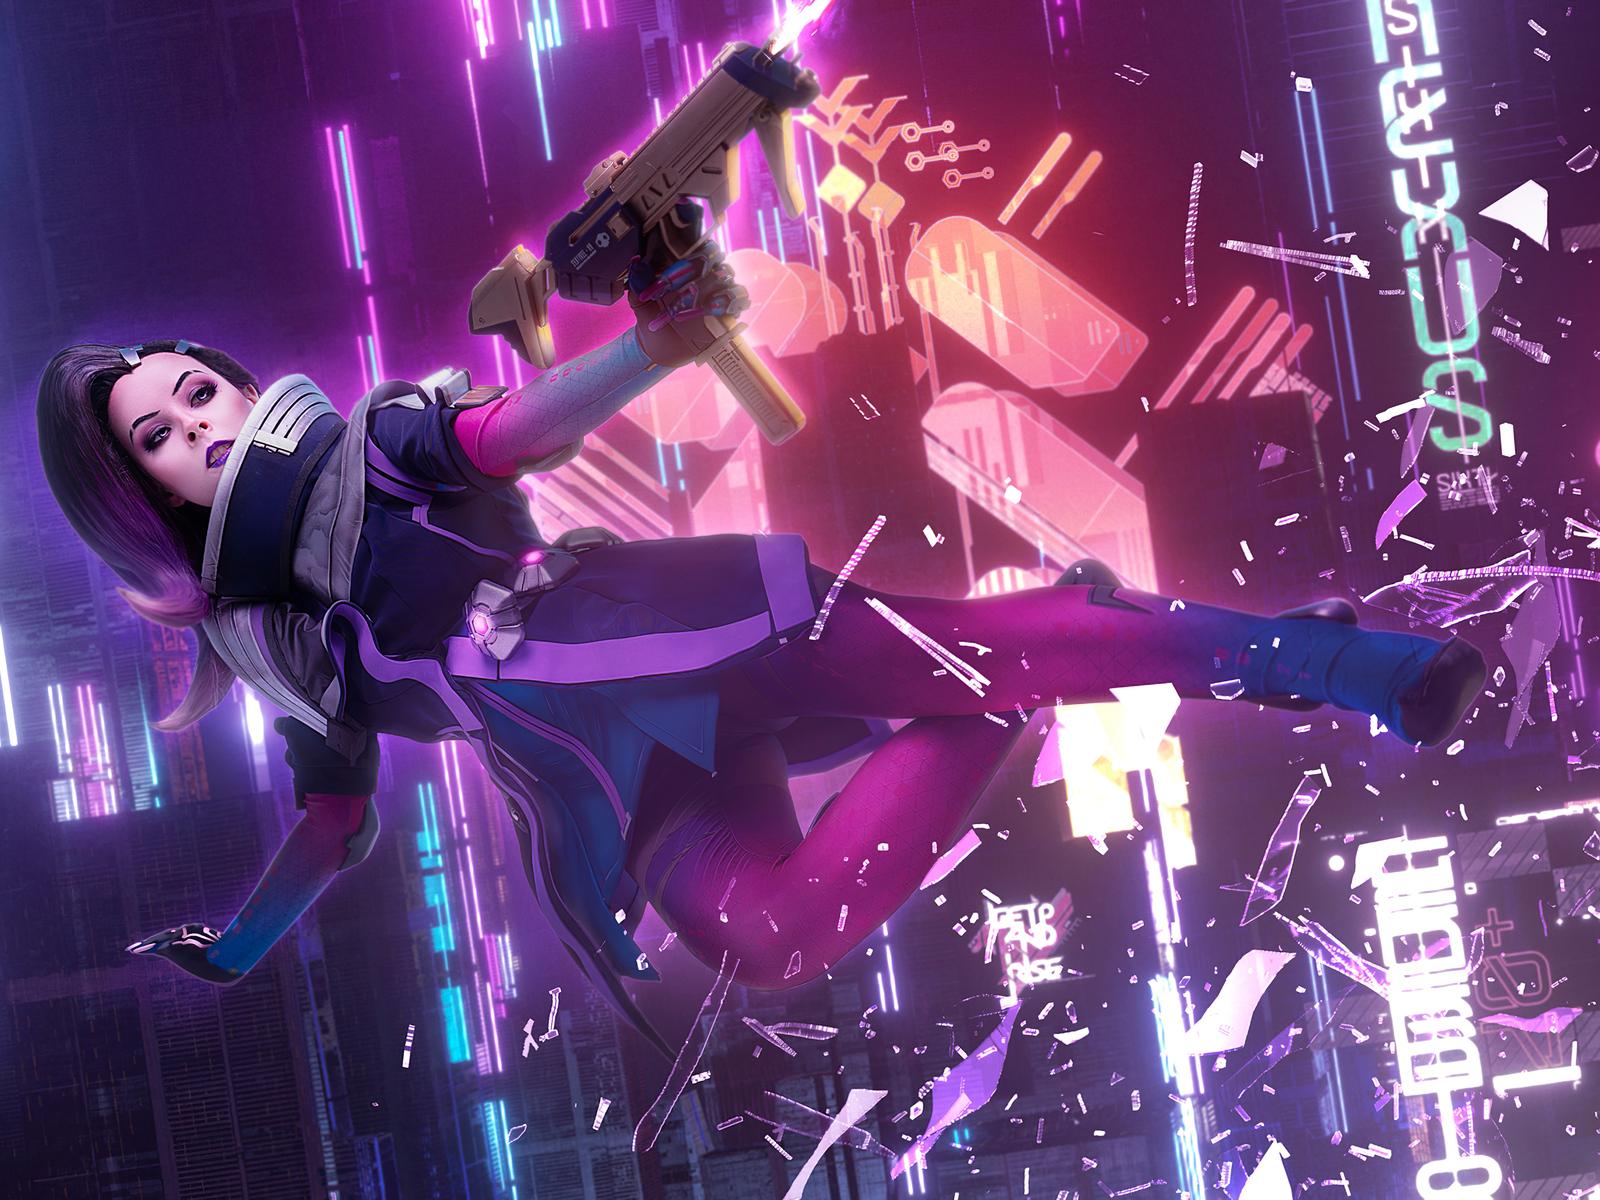 sombra-overwatch-cosplay-4k-1j.jpg